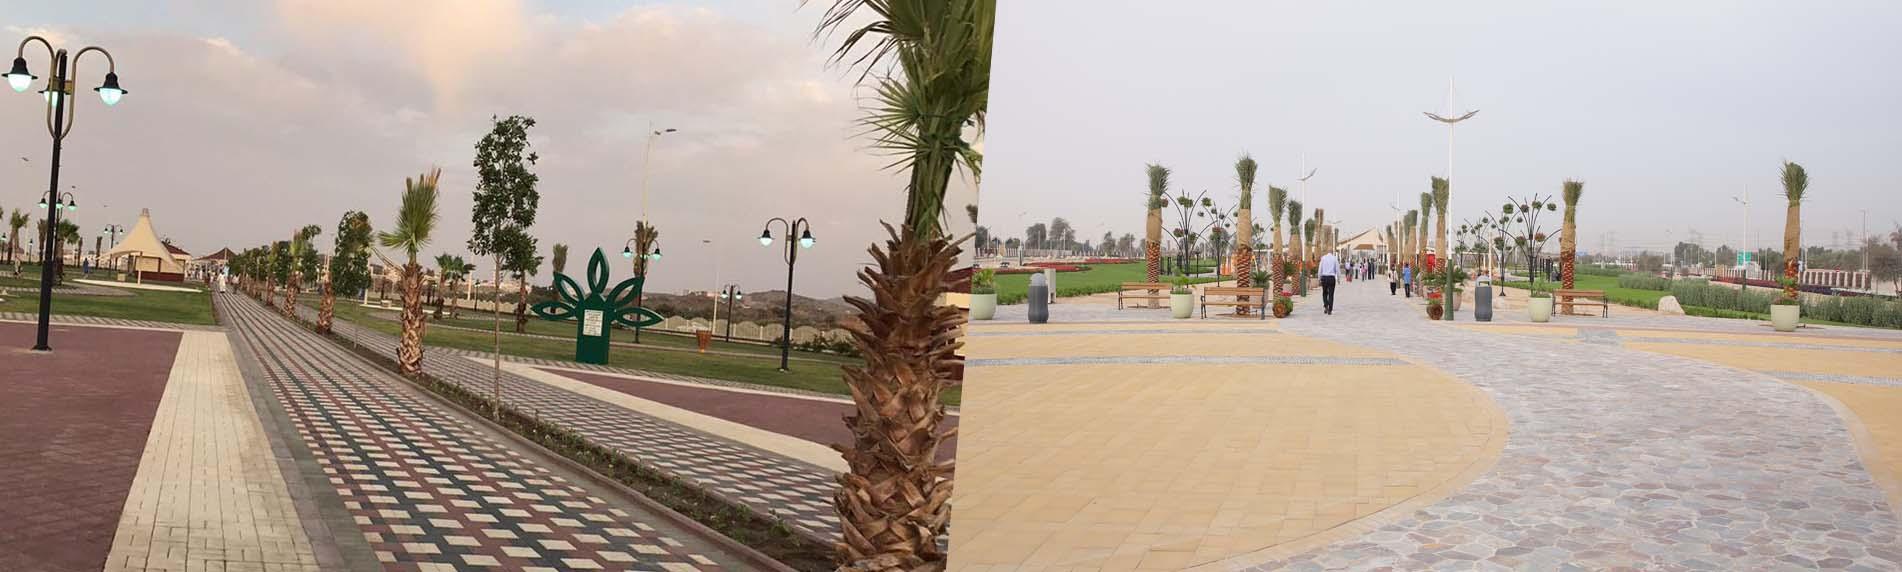 palm-oasis-park-frontimg.jpg